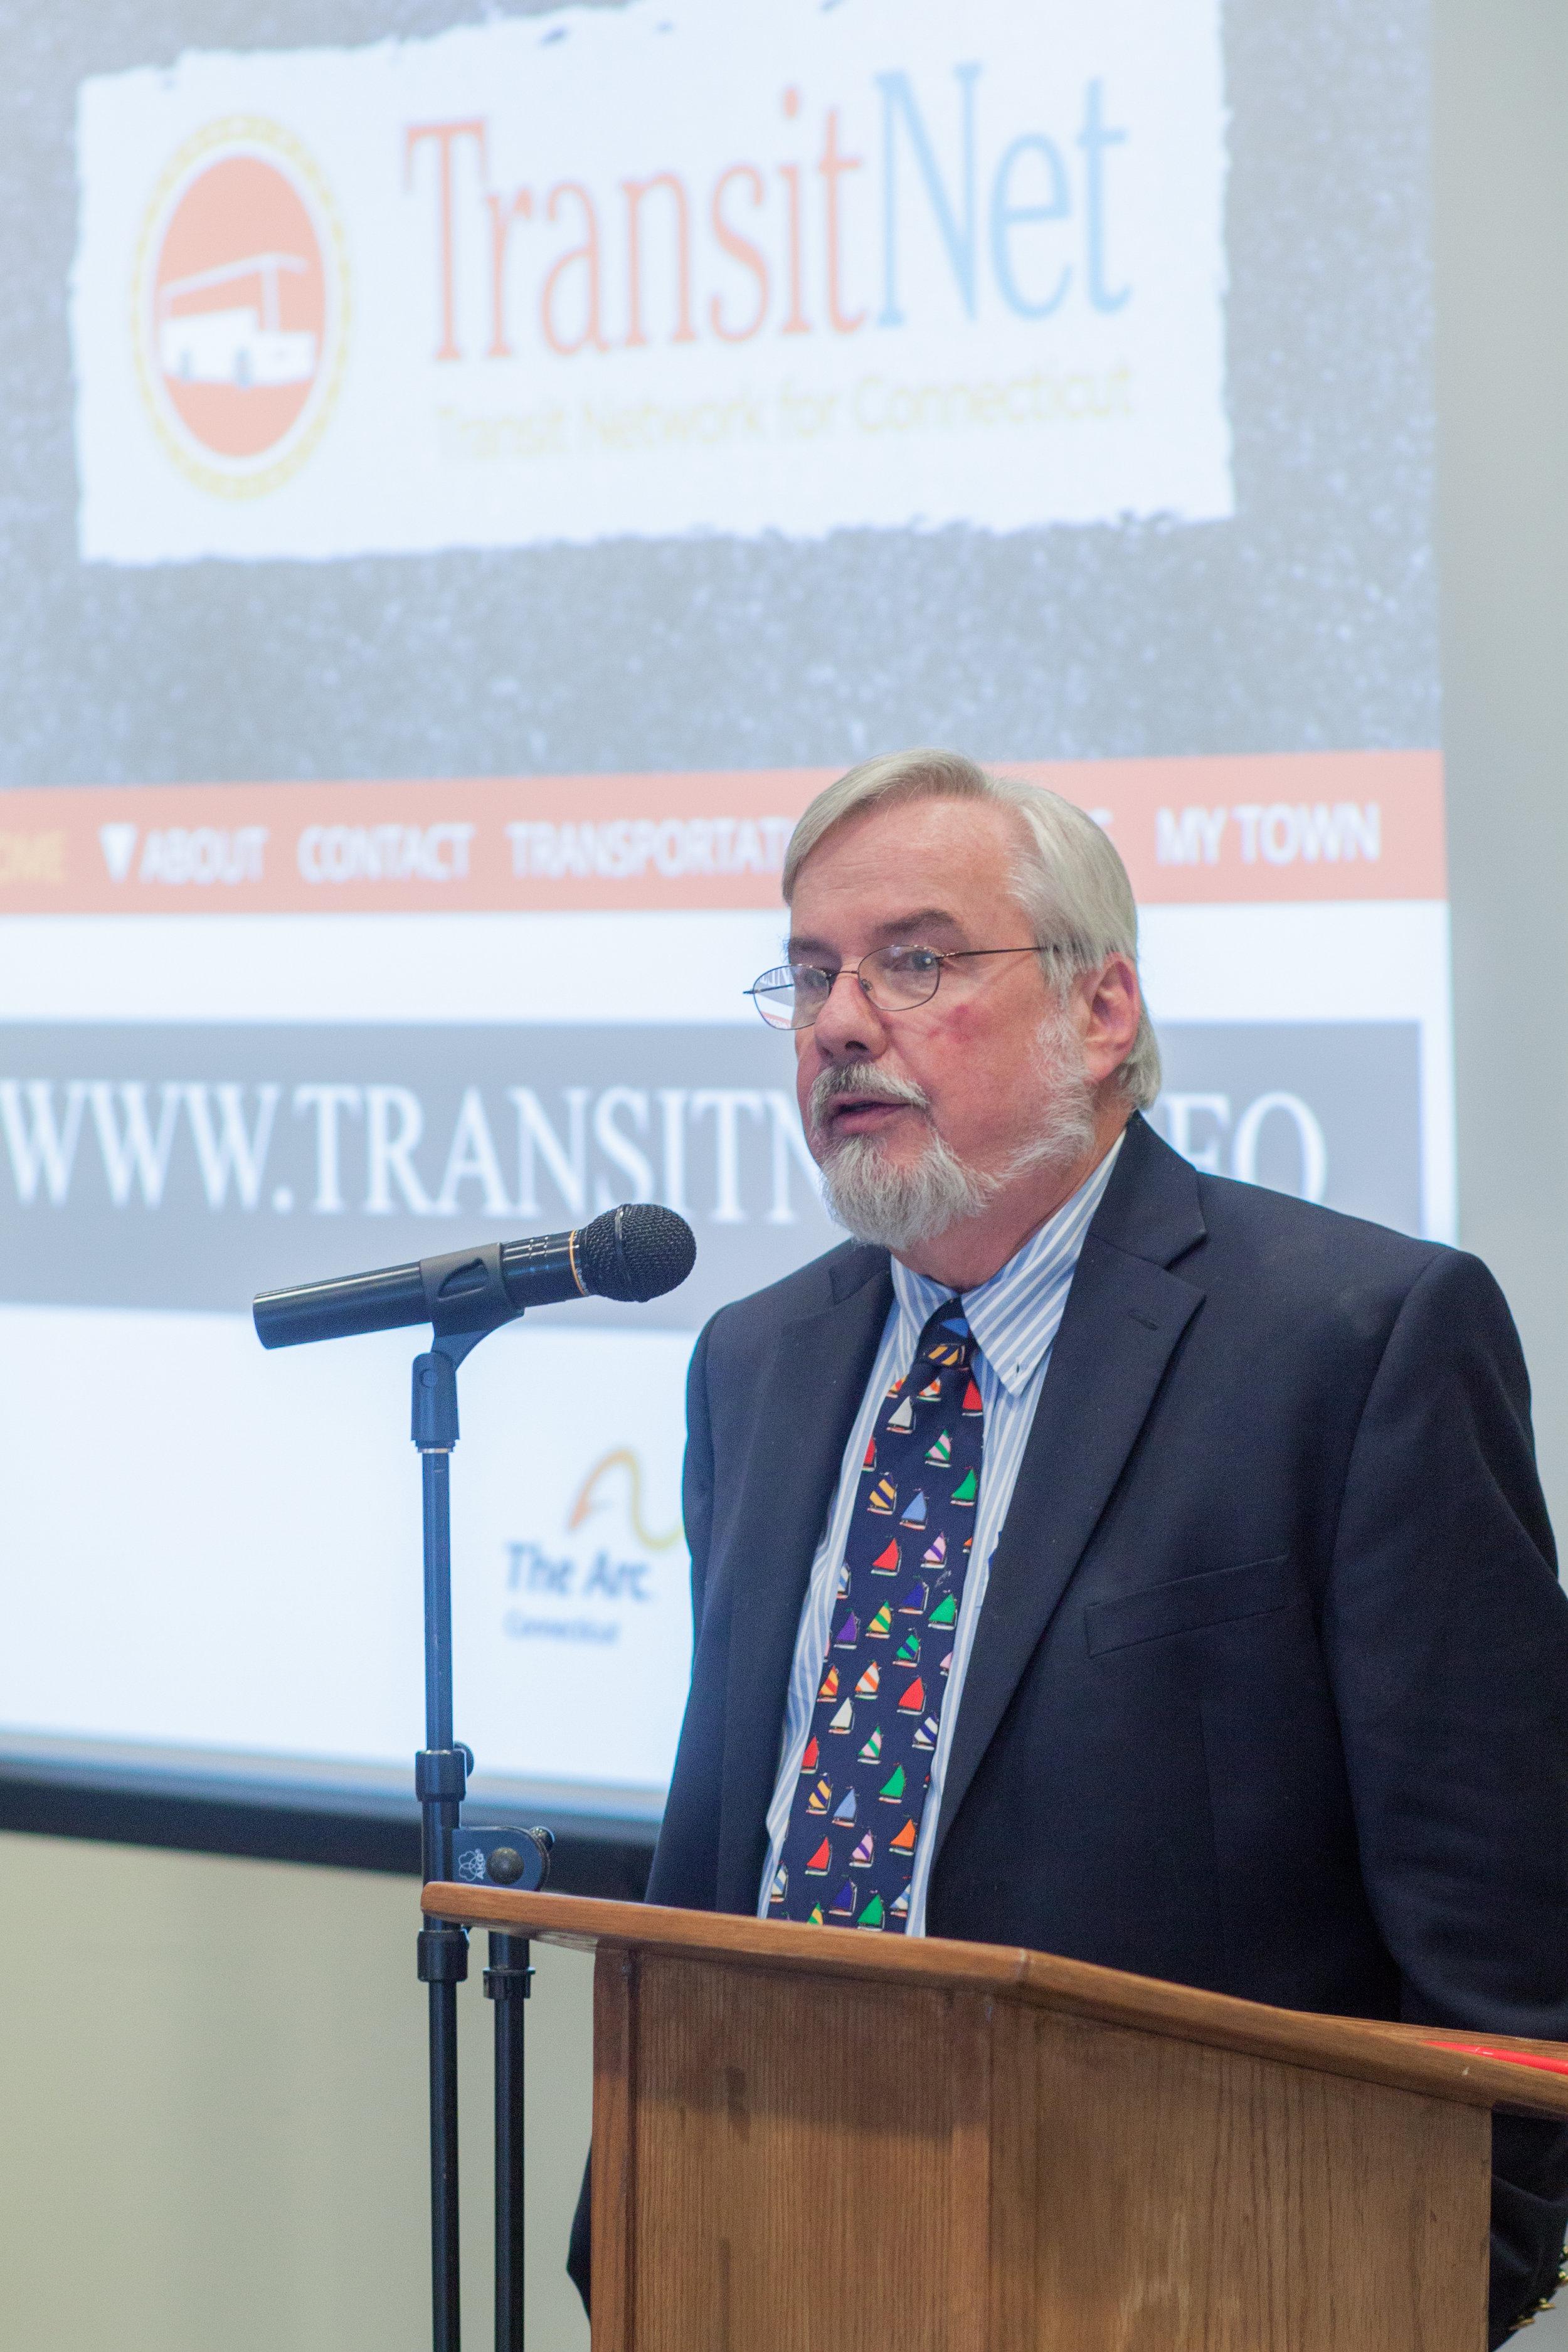 10.22.14 Arc TransitNet Website Launch-42.JPG